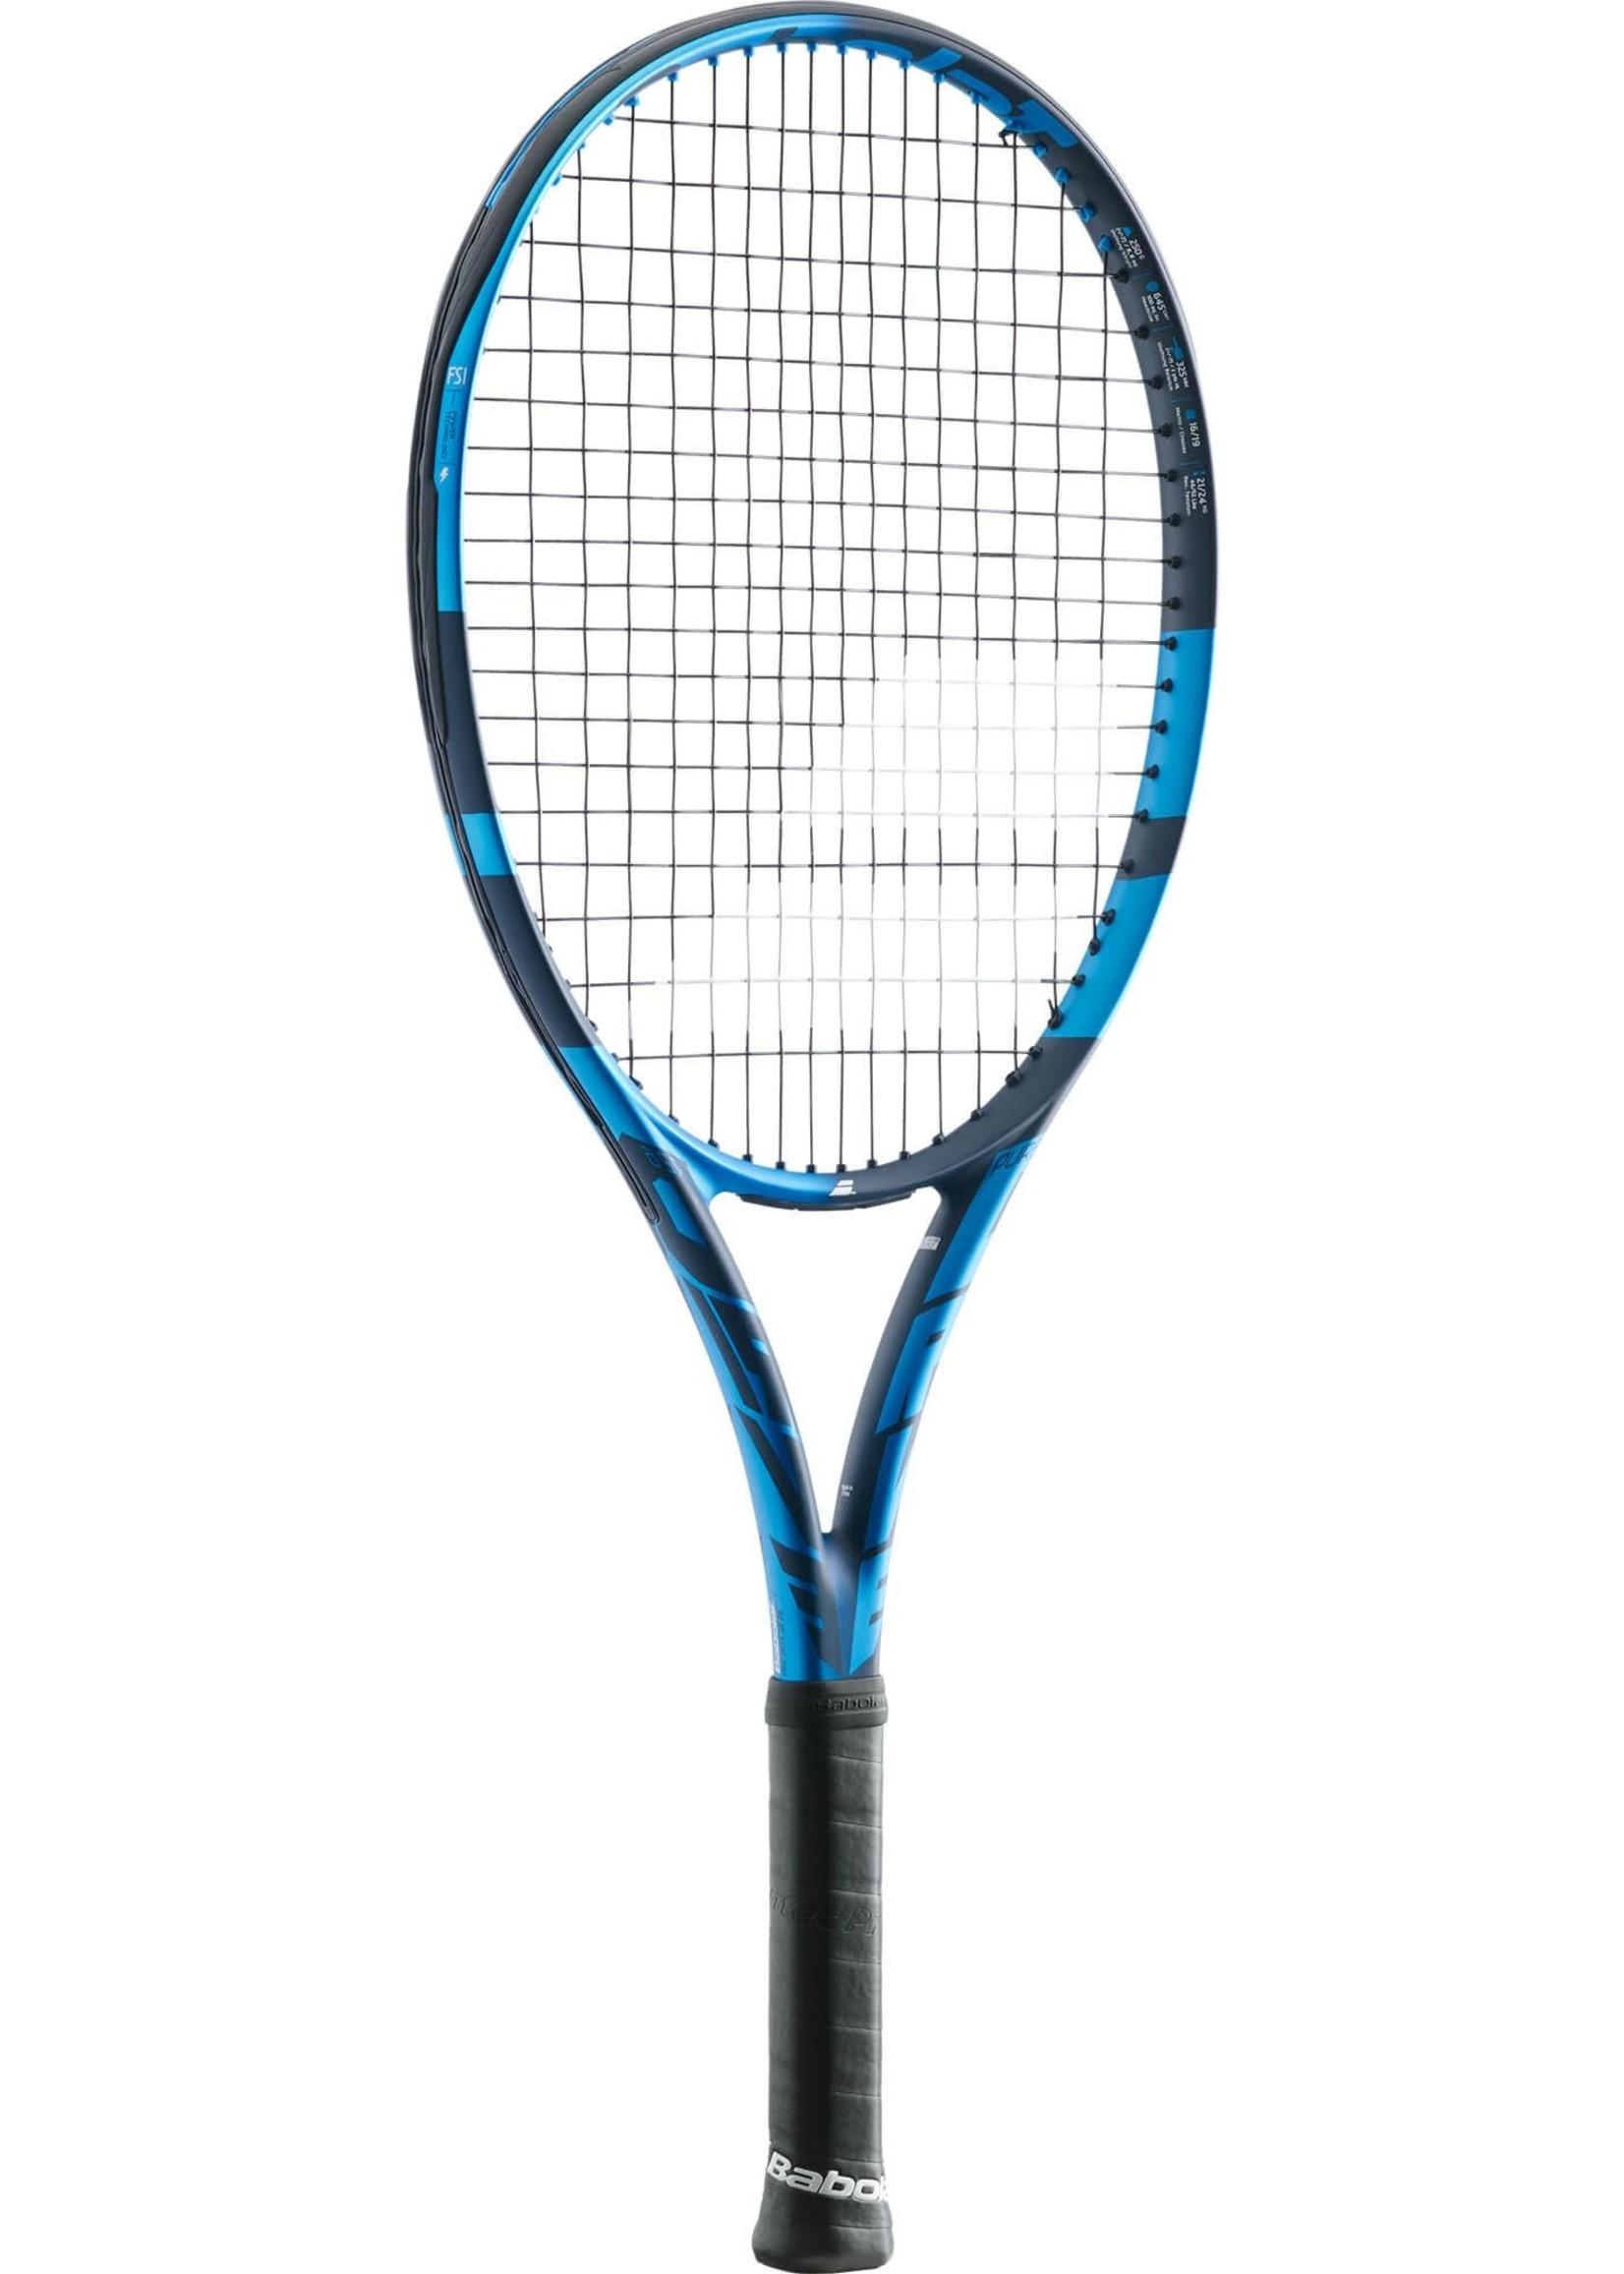 "Babolat Babolat Pure Drive Junior Tennis Racket 25"" (2021) - Blue"